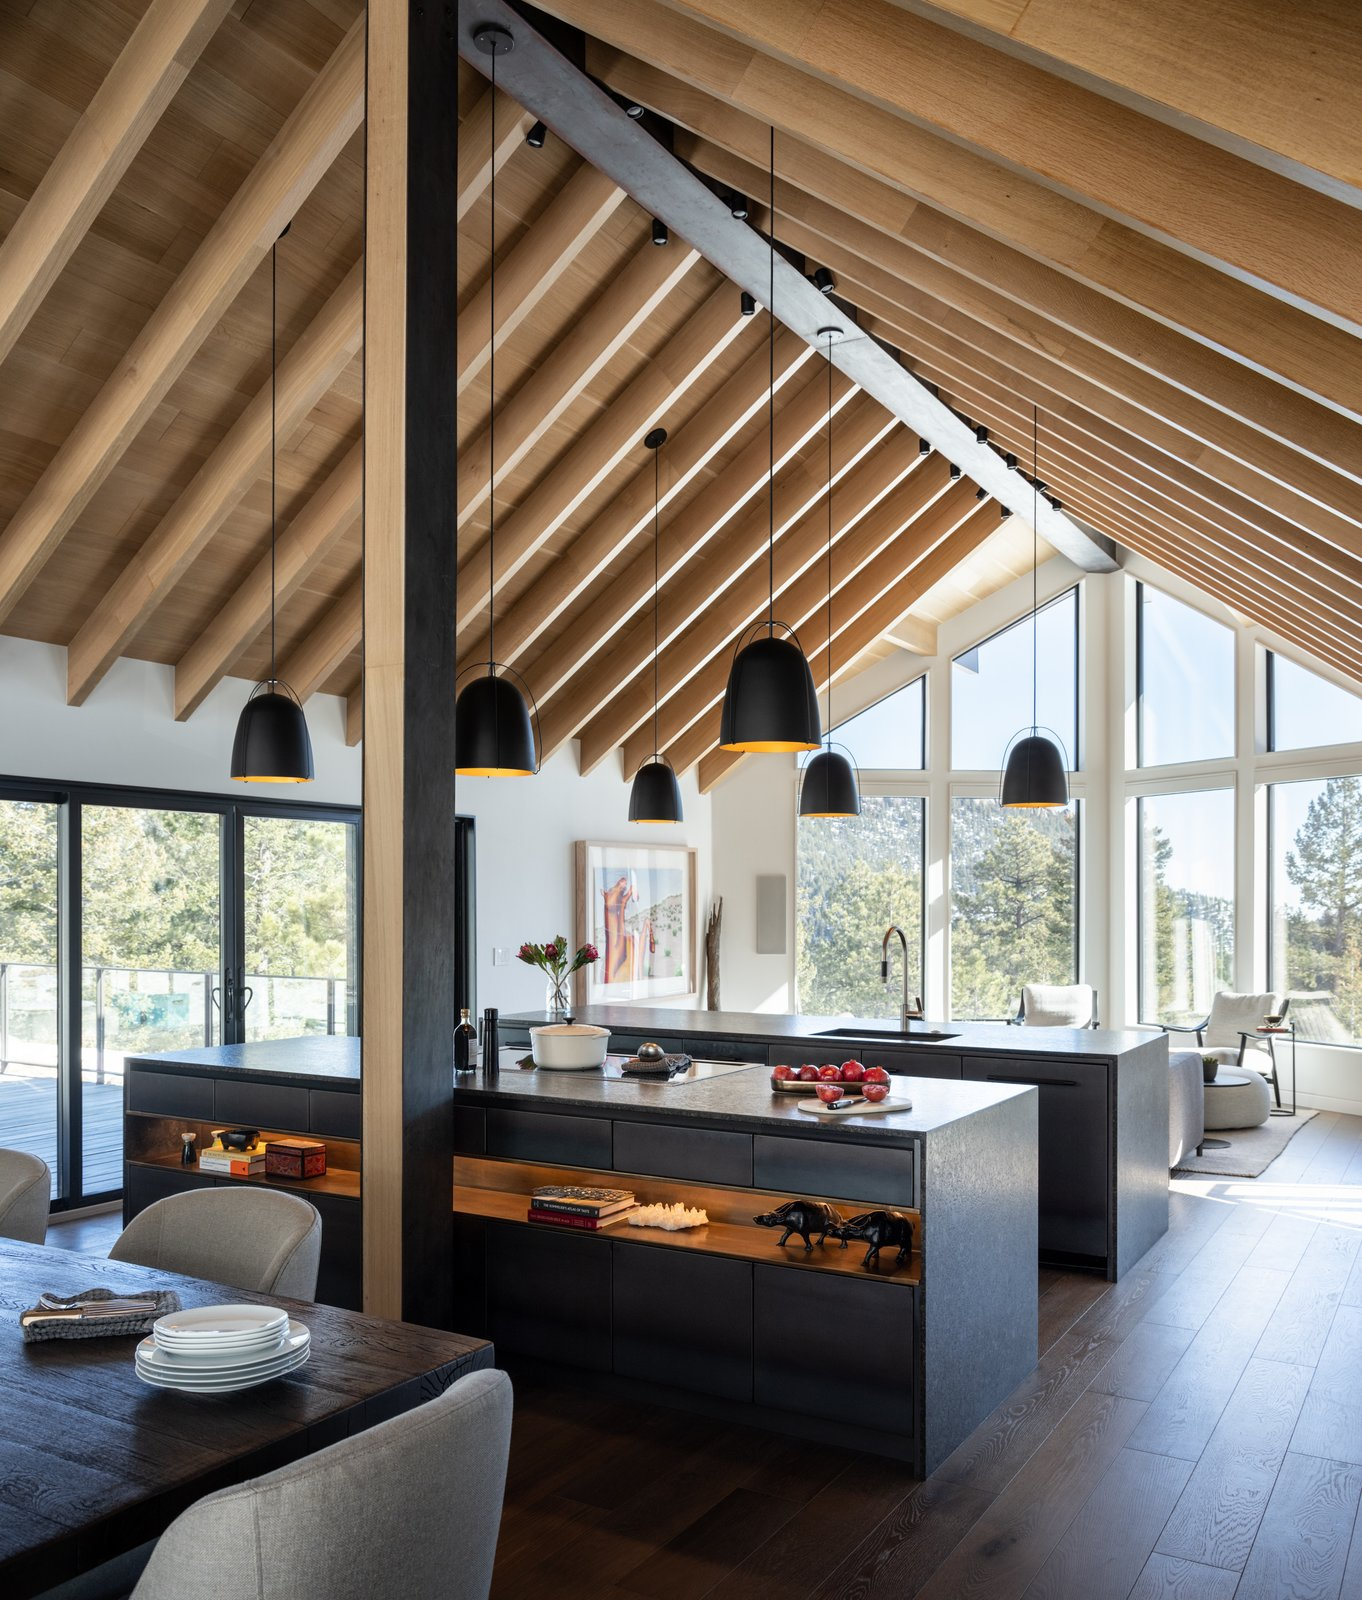 Kitchen, Undermount Sink, Dark Hardwood Floor, Wood Cabinet, Range, and Pendant Lighting  Modern Cabin by HMHAI